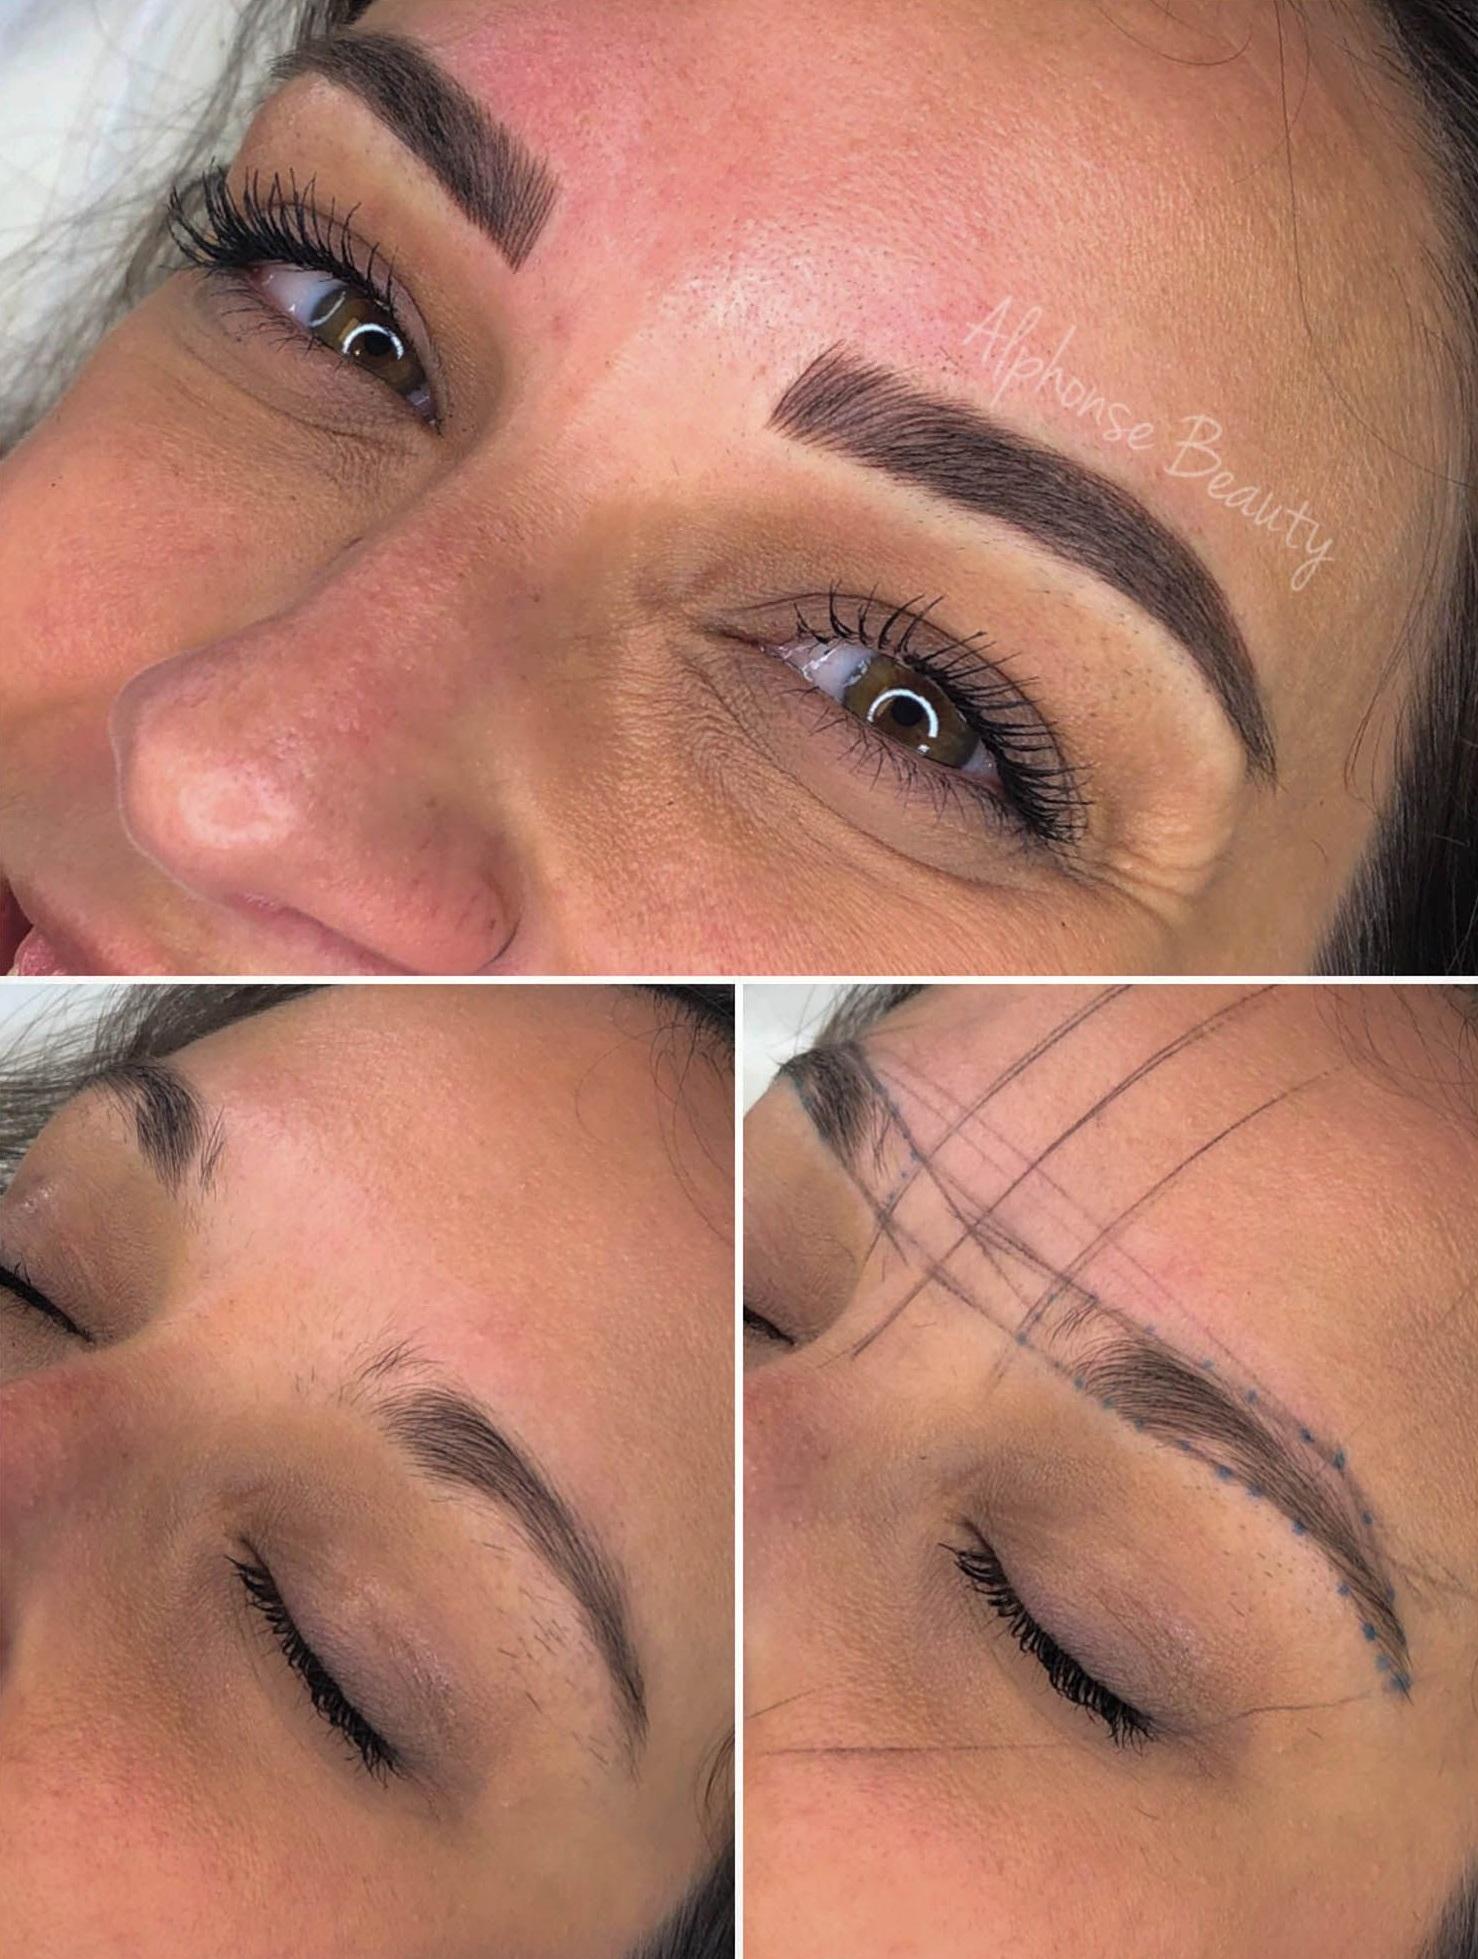 Alphonse Beauty Microblading | Michigan - Eyebrow